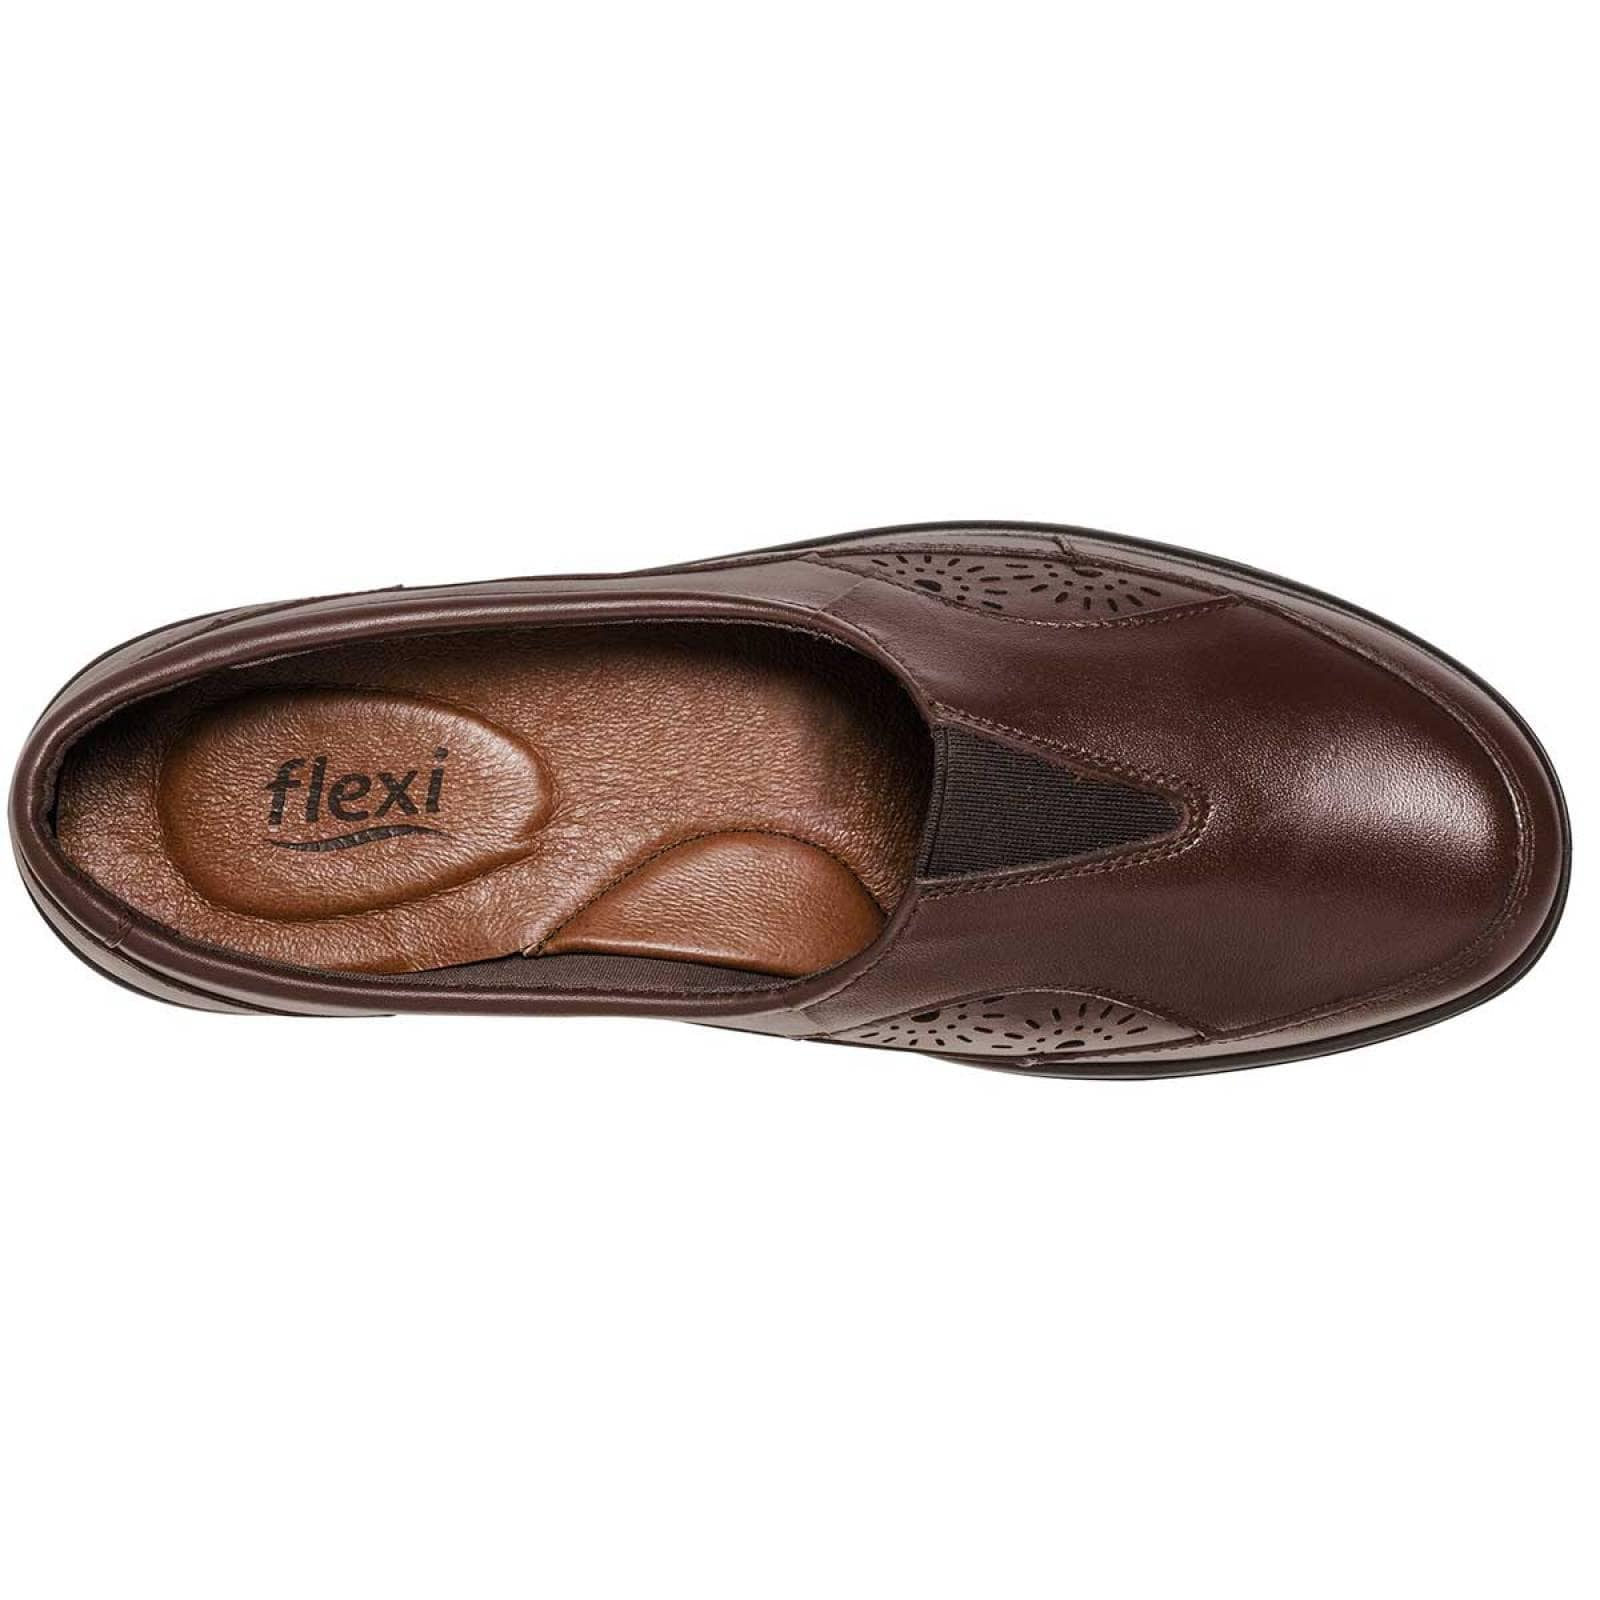 Flexi Zapato Mujer Cafe